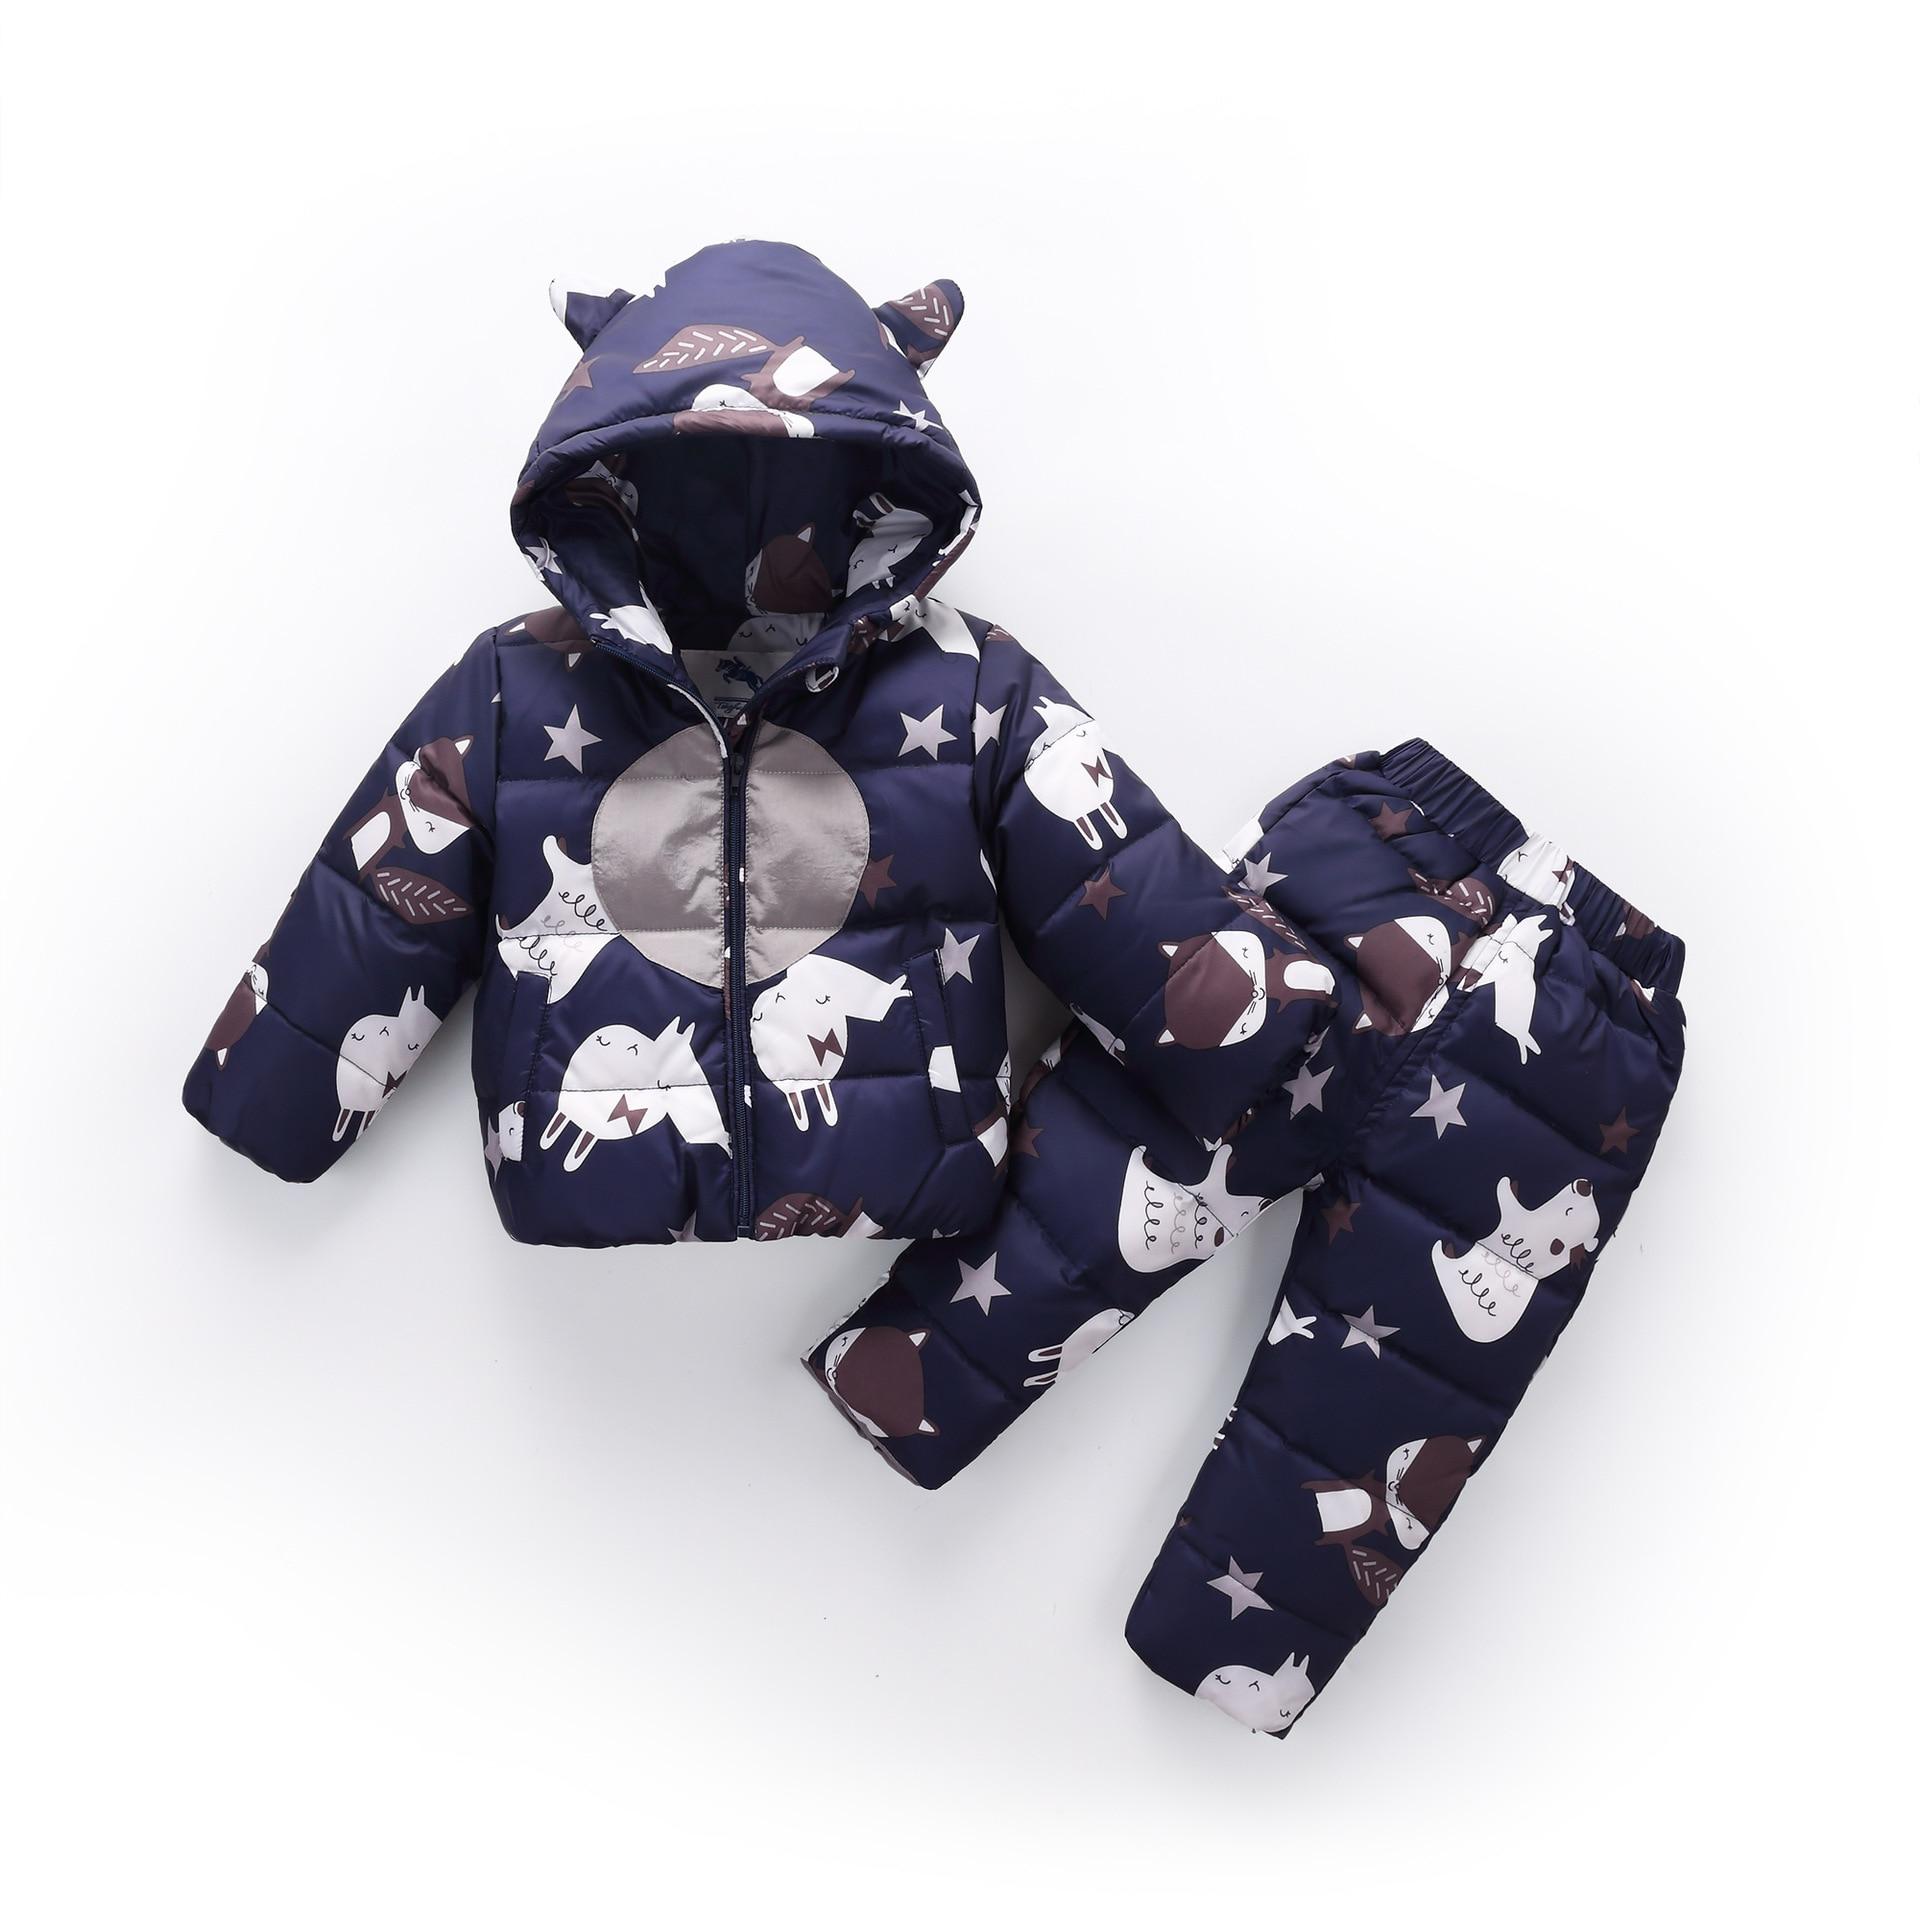 2018 Russian Winter Children Sets Warm Fashion Down Jacket for Baby Boy Girl Children's Coat Snow Wear Kids Ski Suit 1-3Years цена